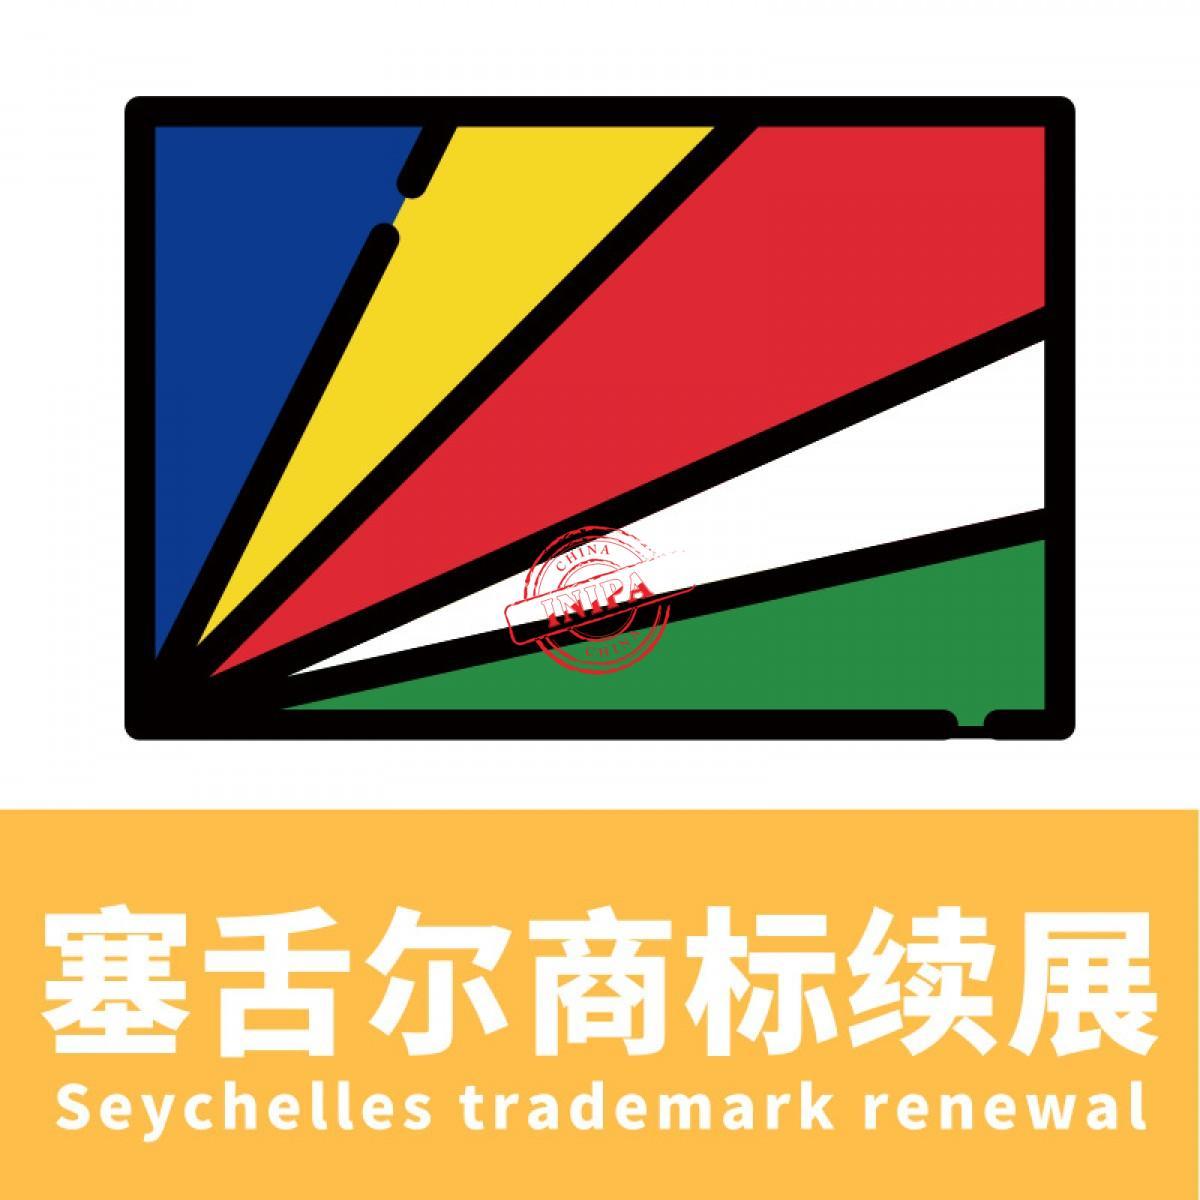 塞舌尔商标续展/Seychelles trademark renewal